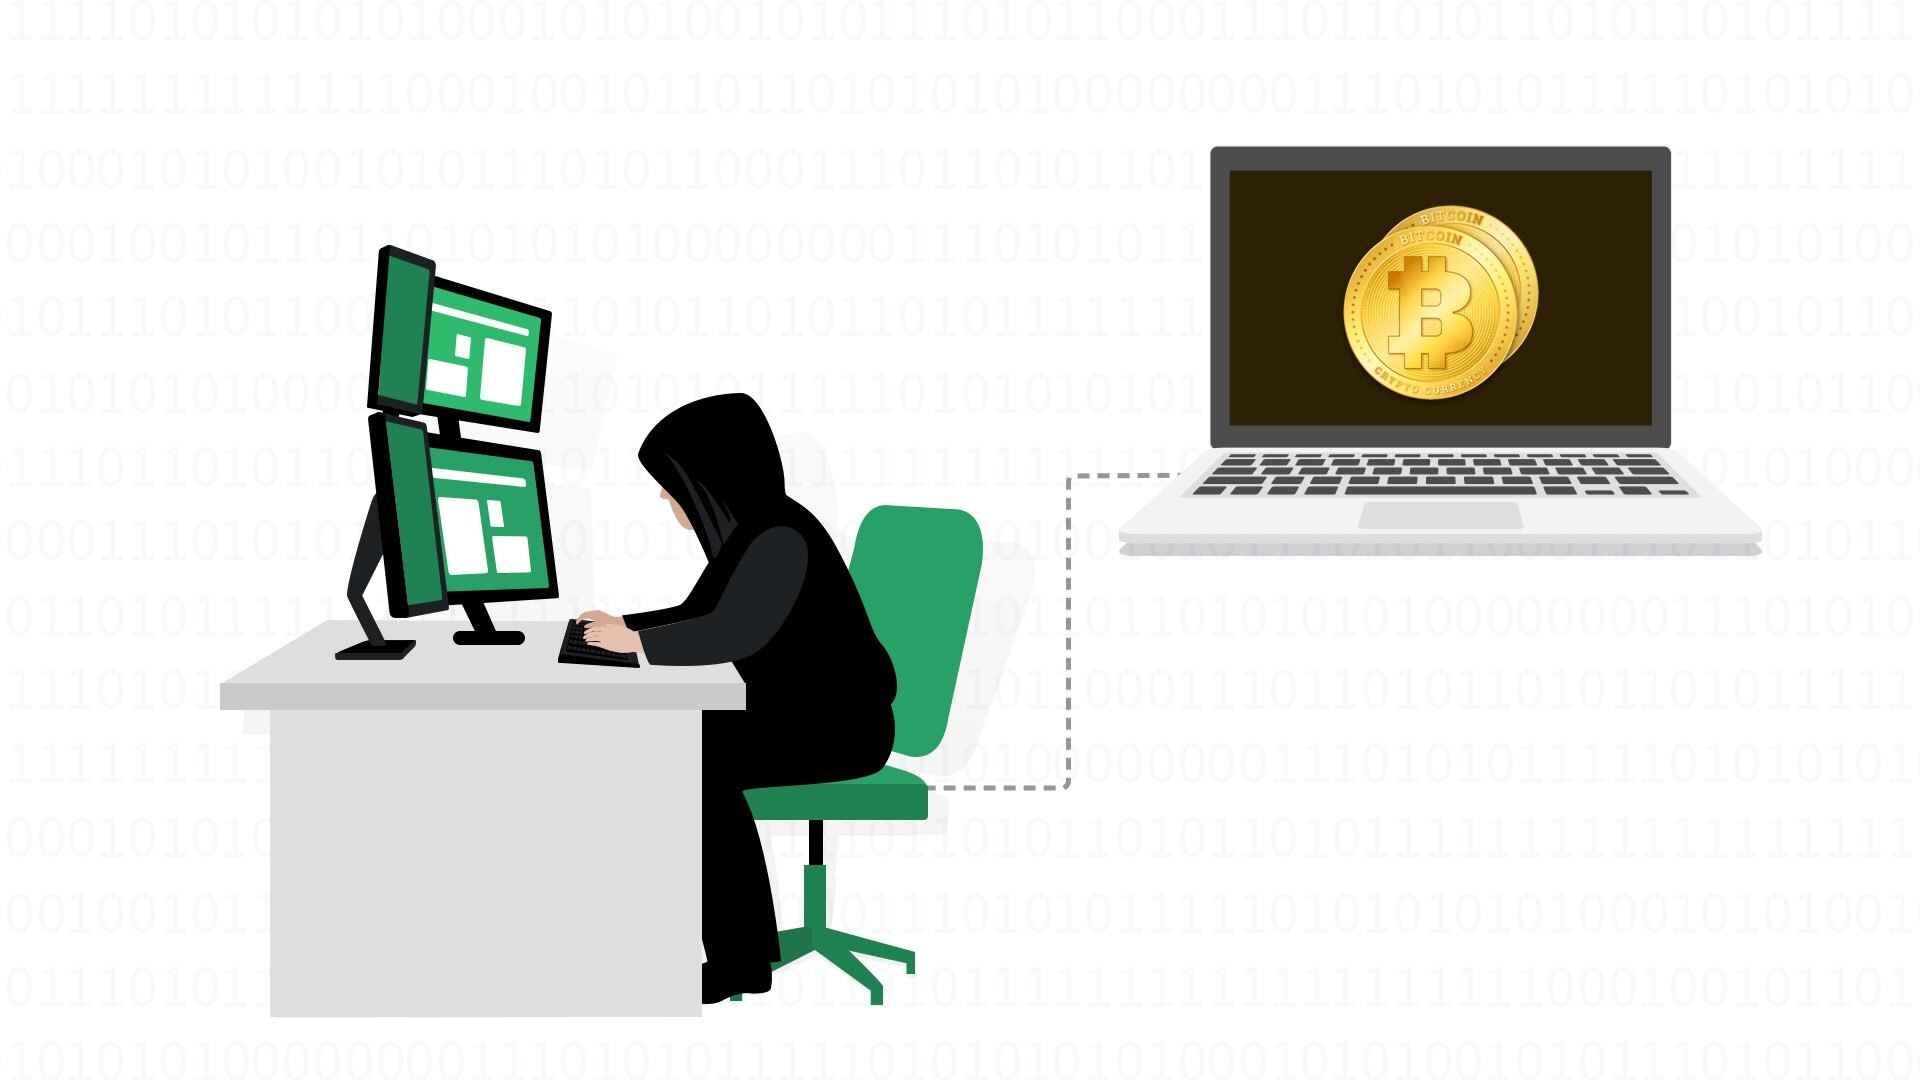 Trojan-miner: reasons and methods